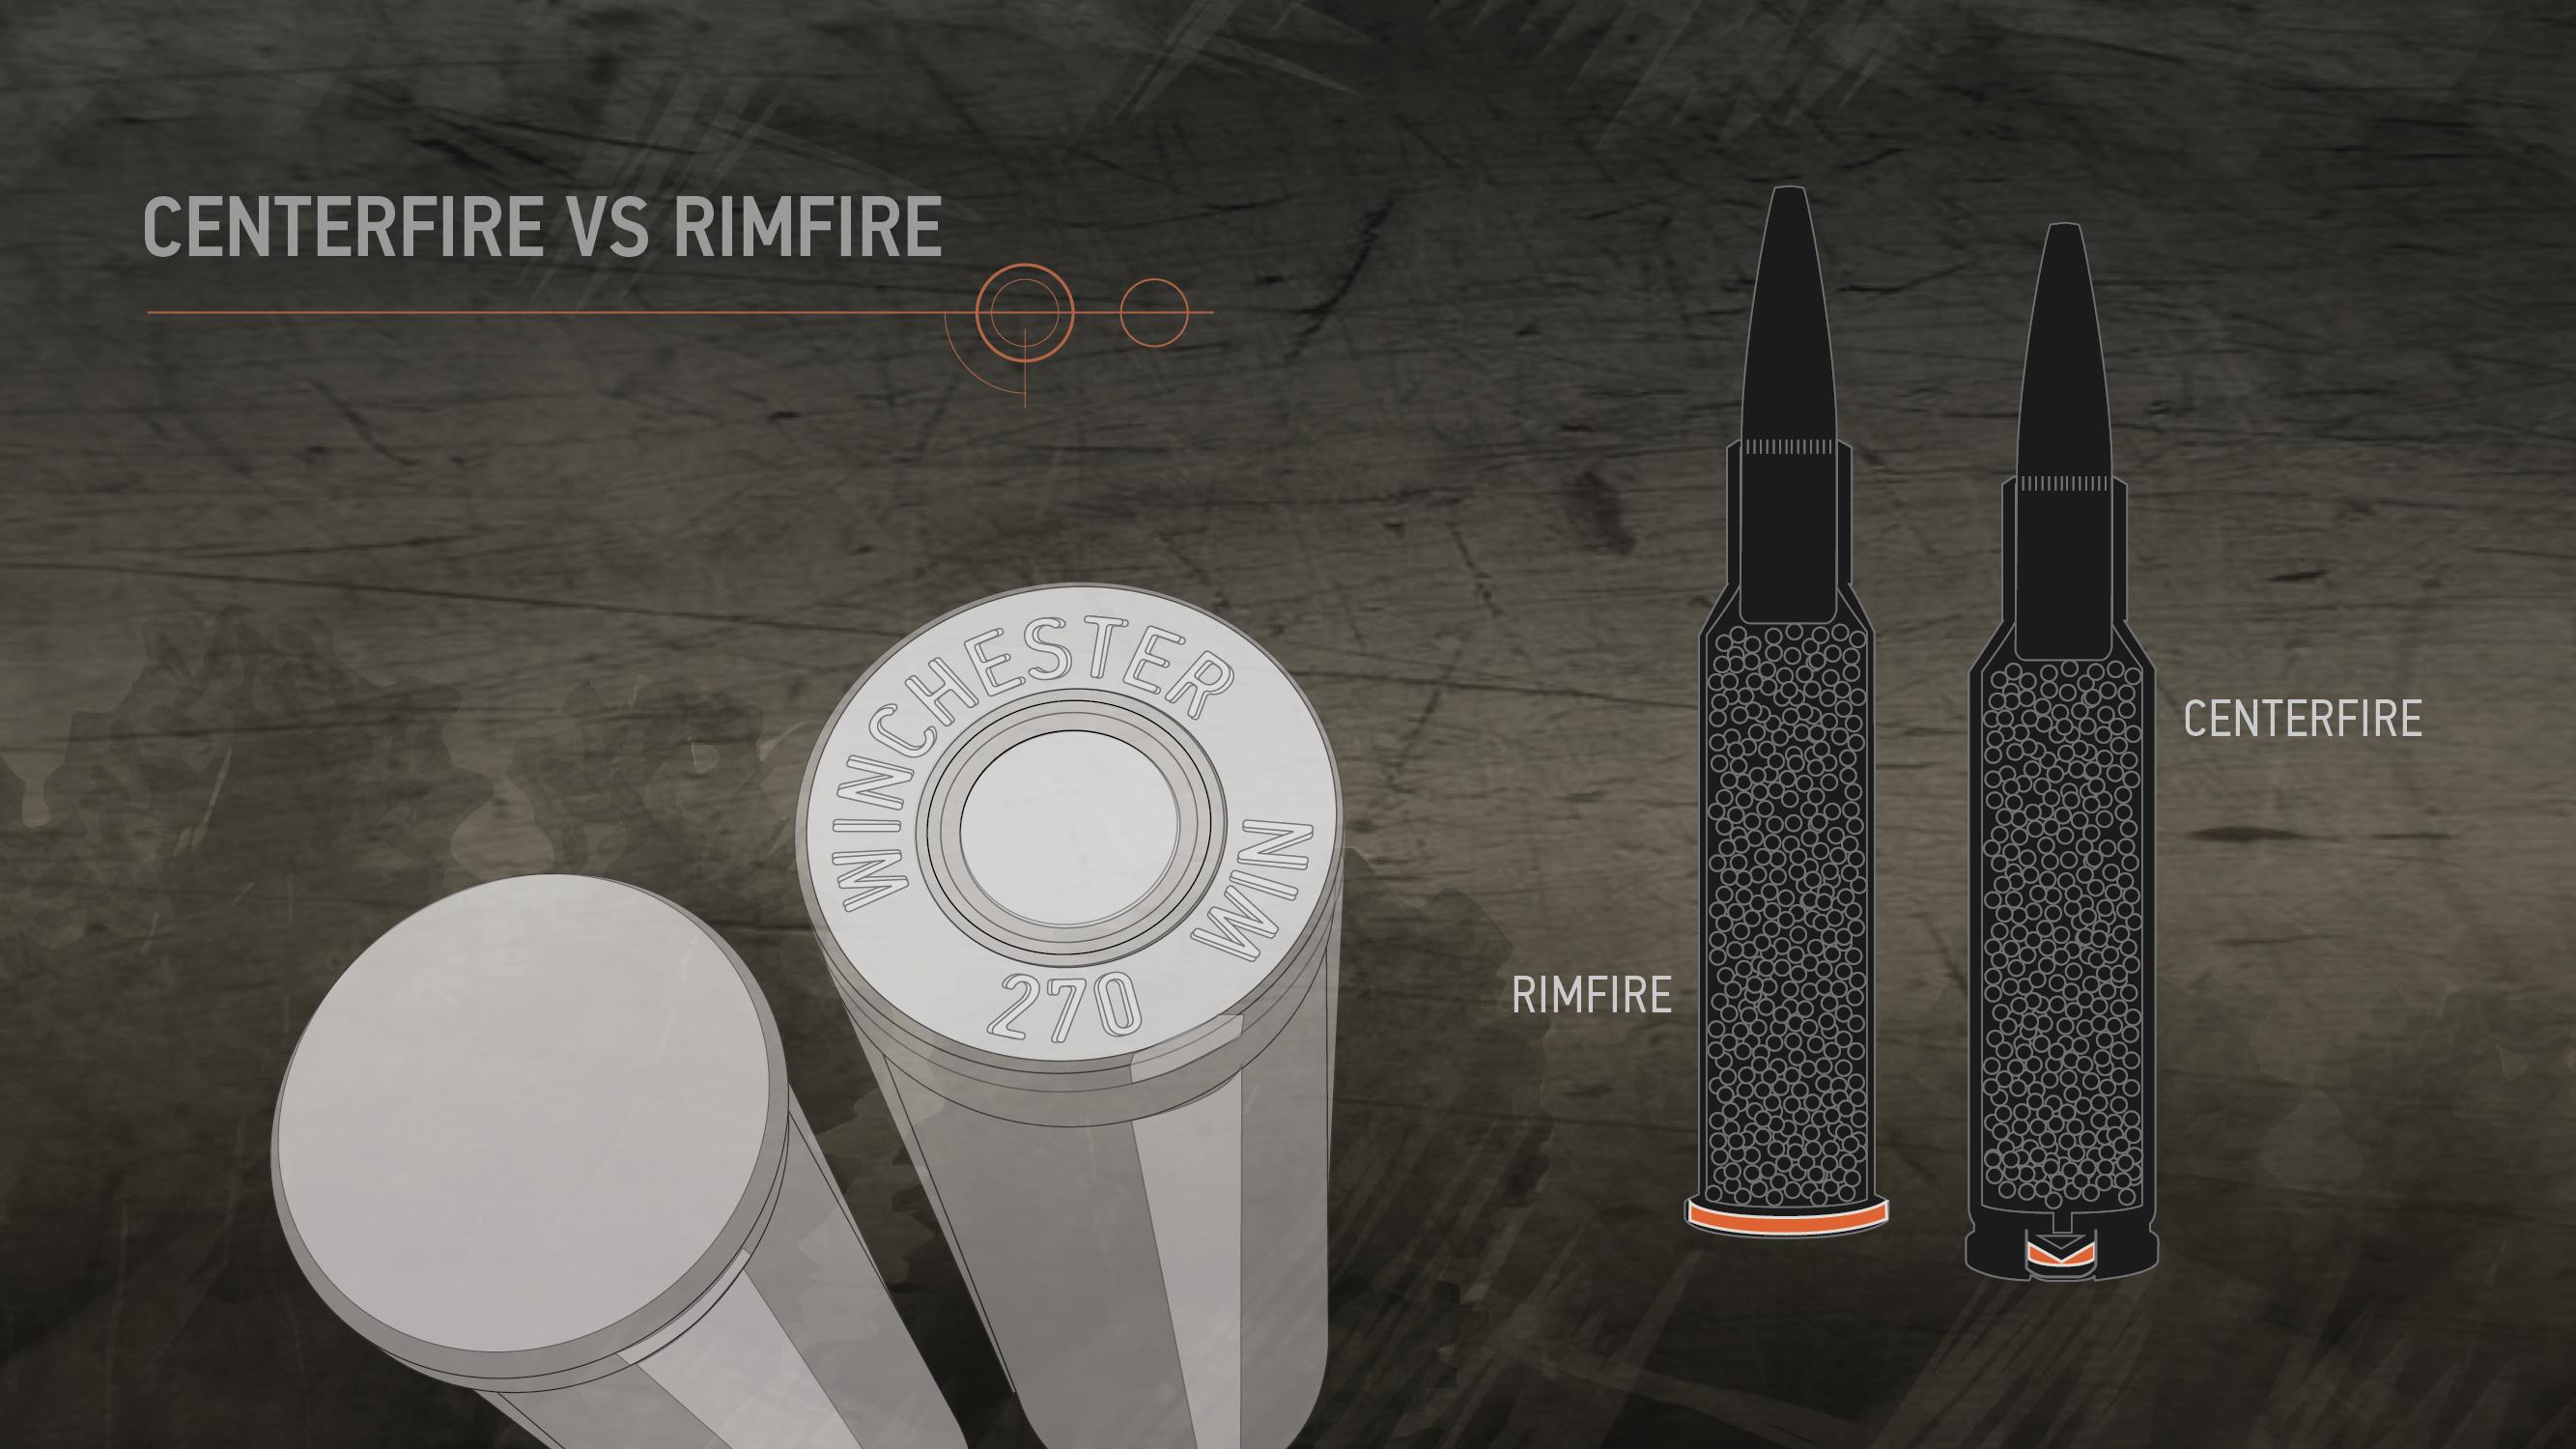 Illustration of rimfire and centerfire ammunition.